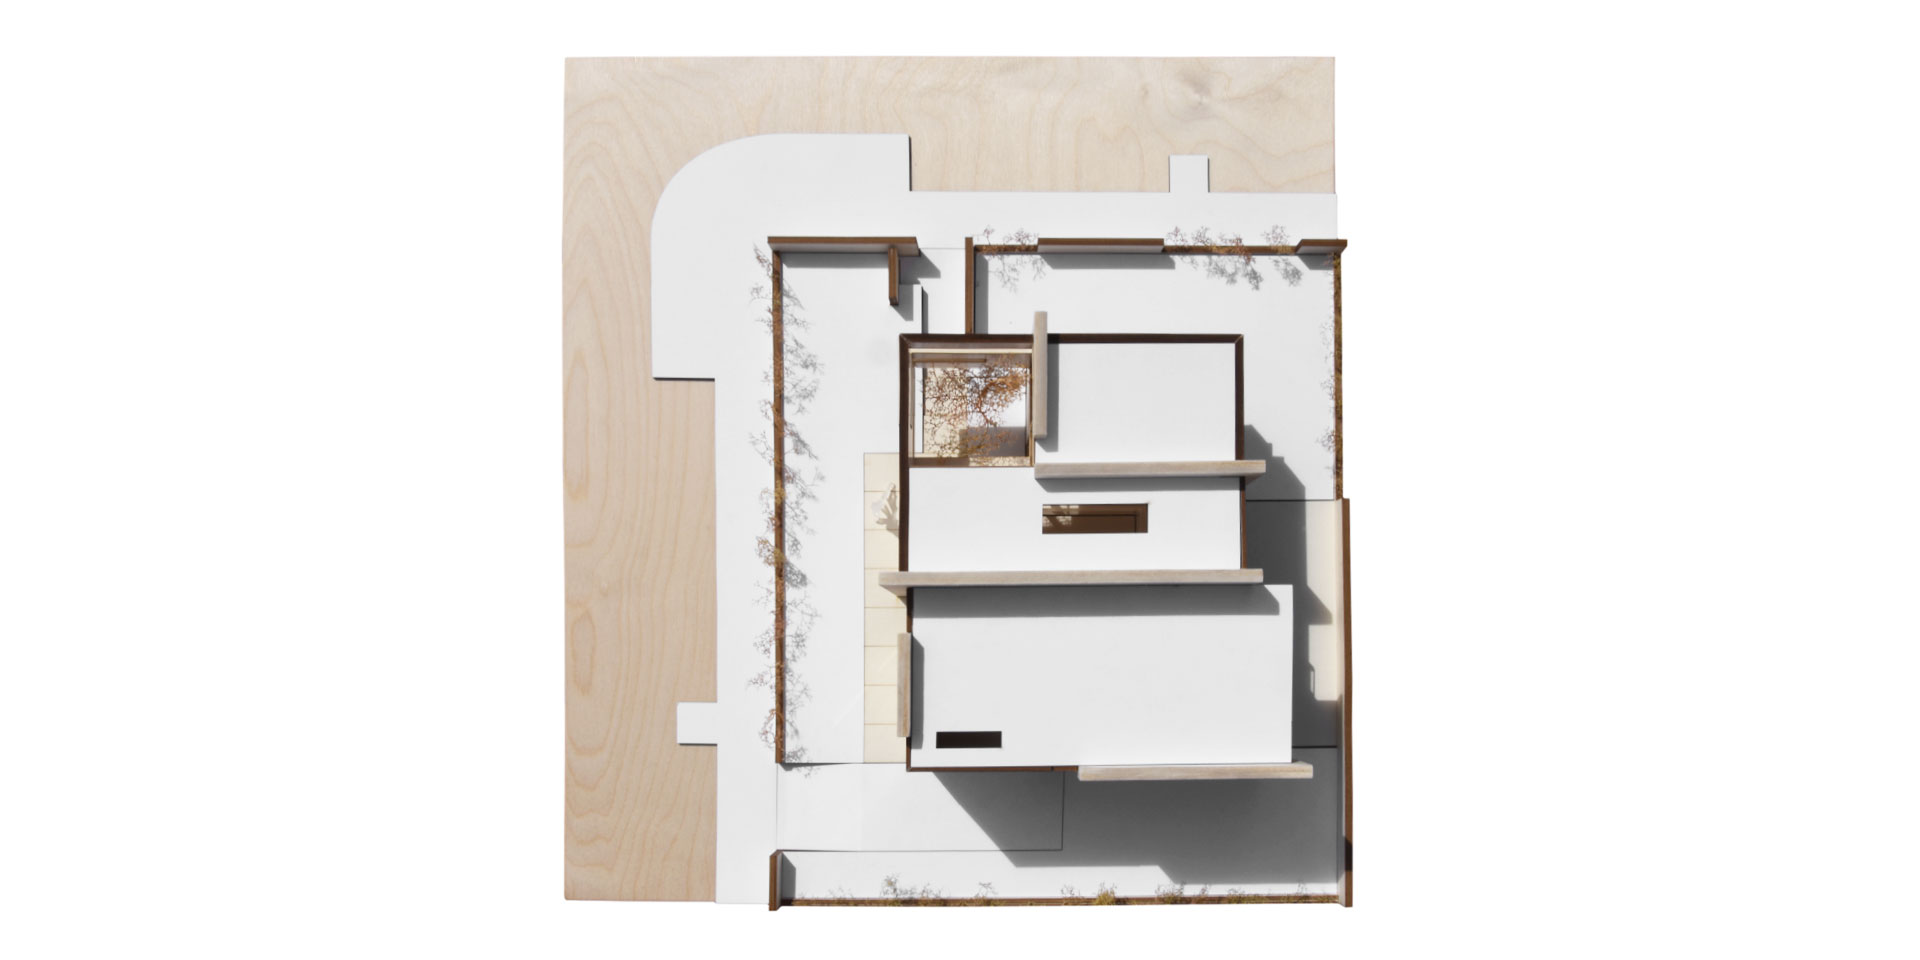 archinow_PYR_residenza-privata_15